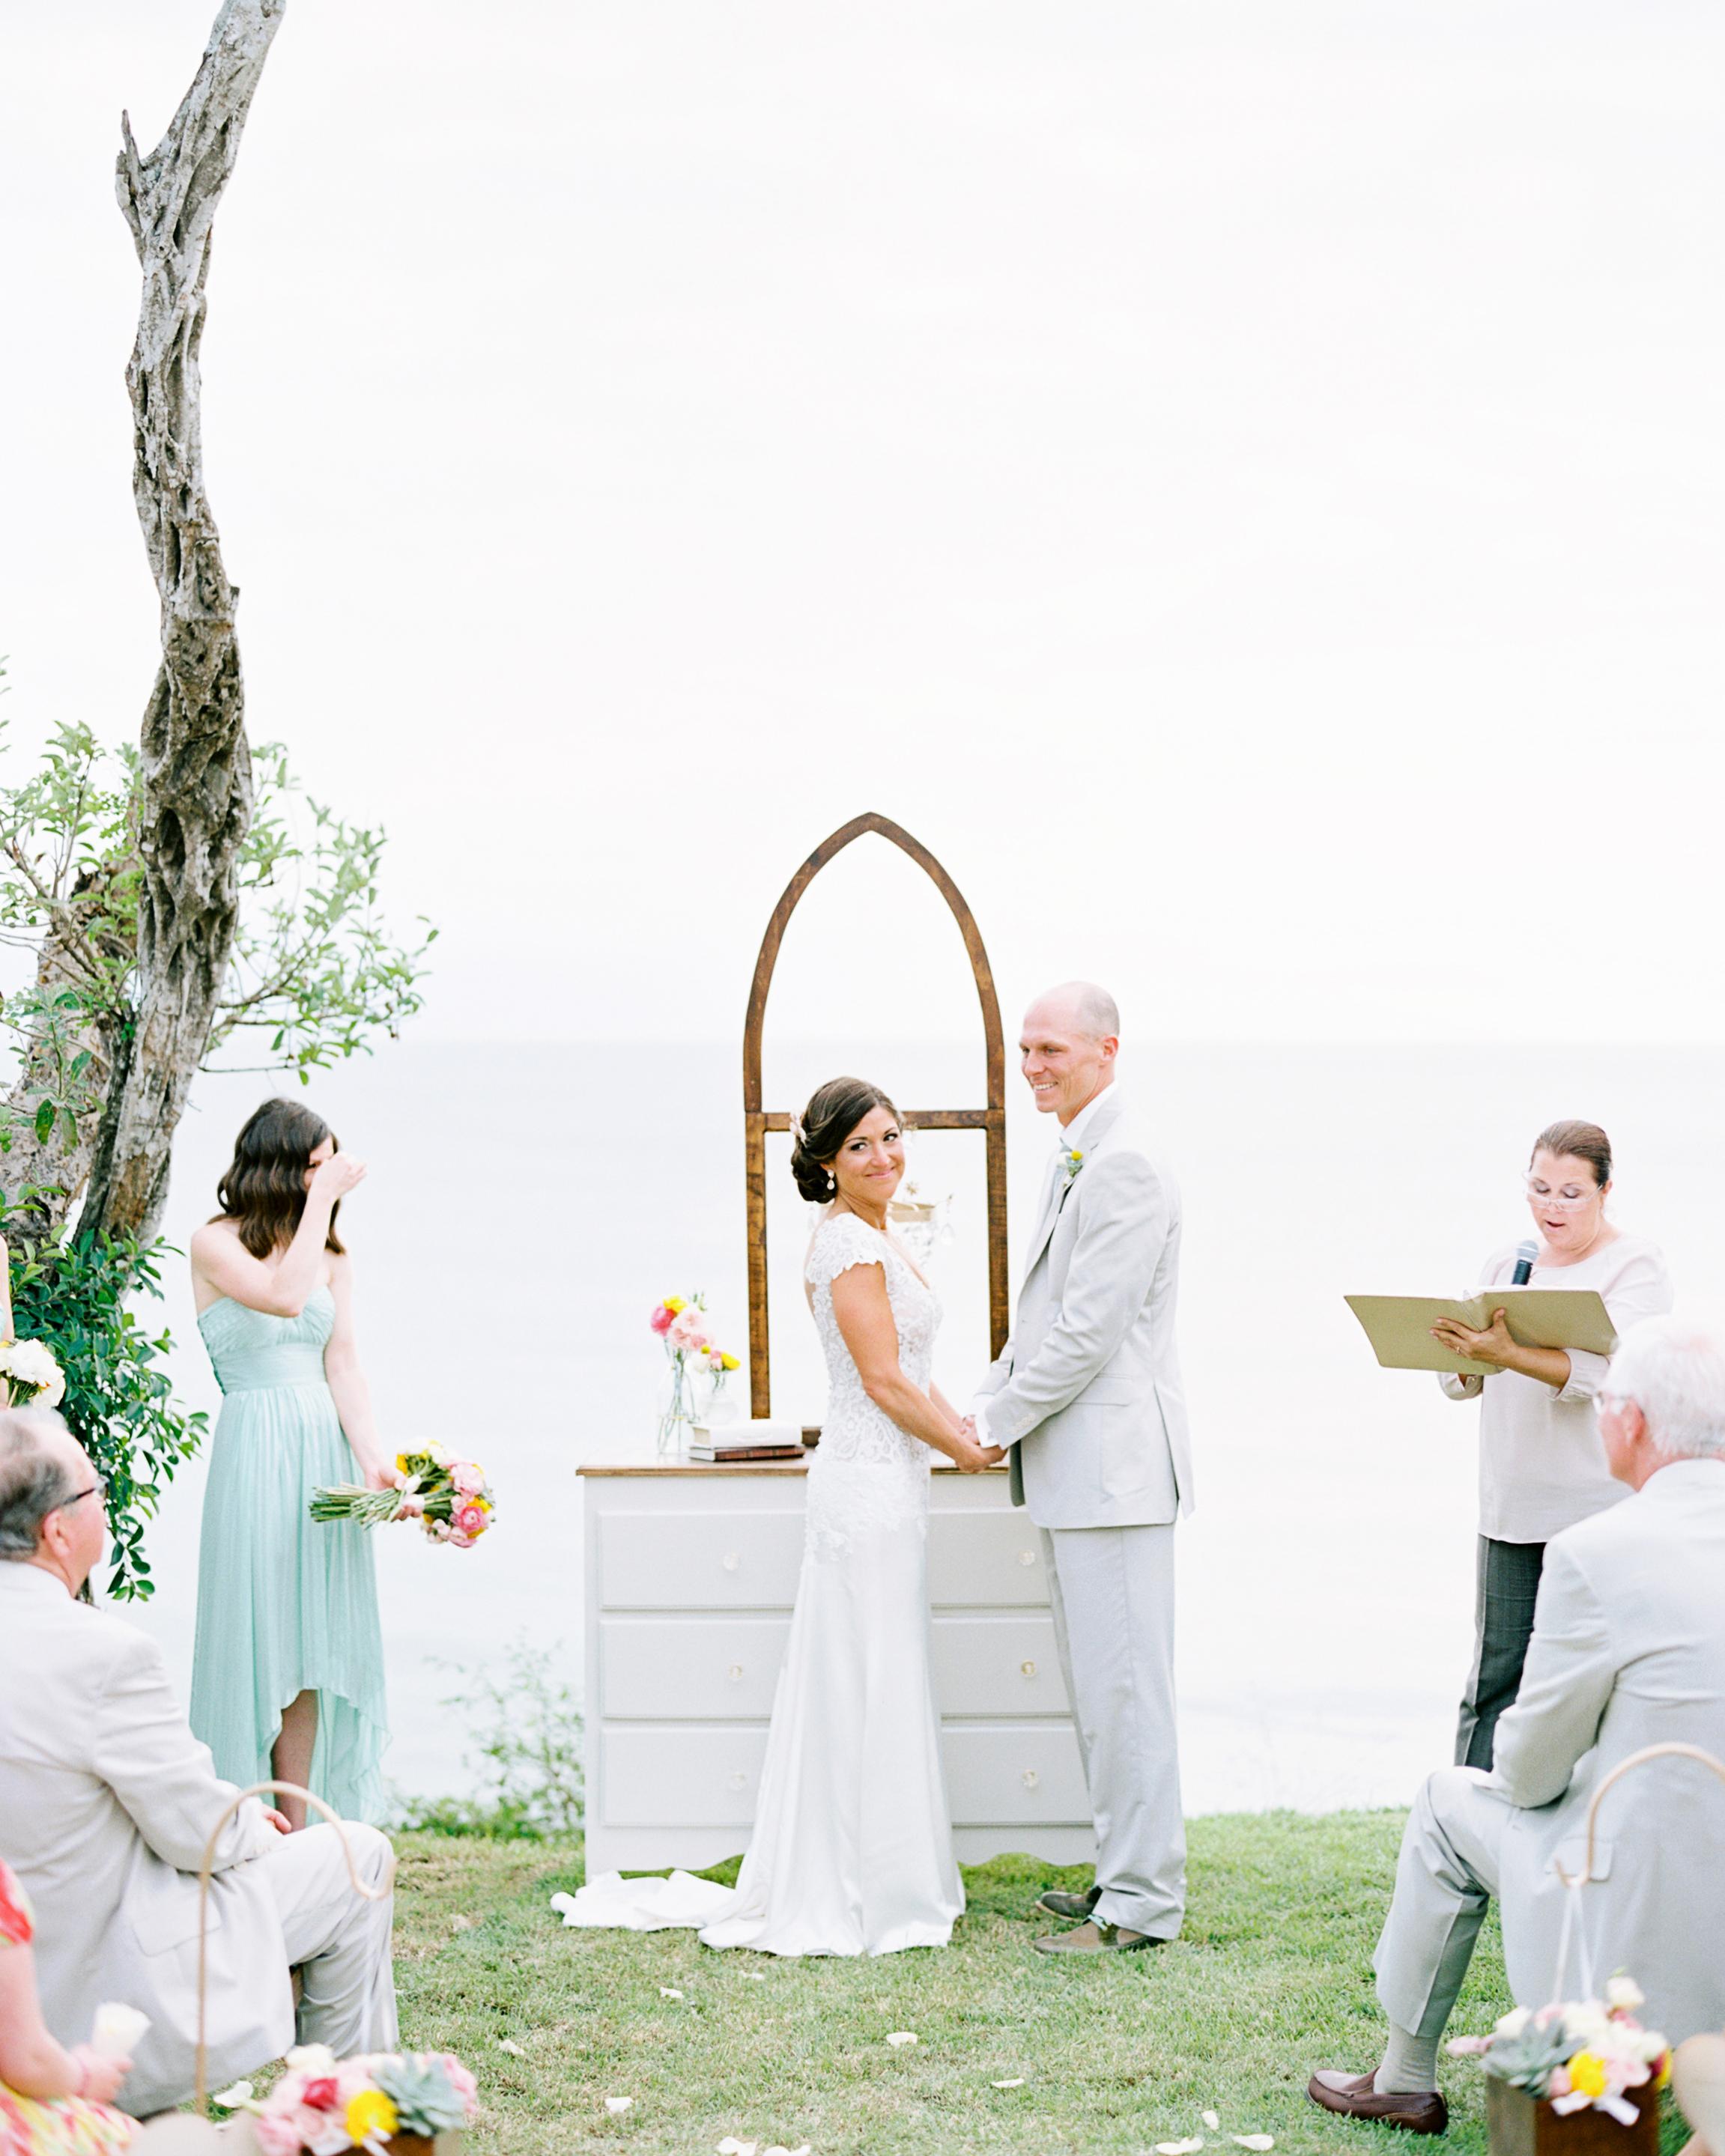 molly-nate-wedding-ceremony-170-s111479-0814.jpg